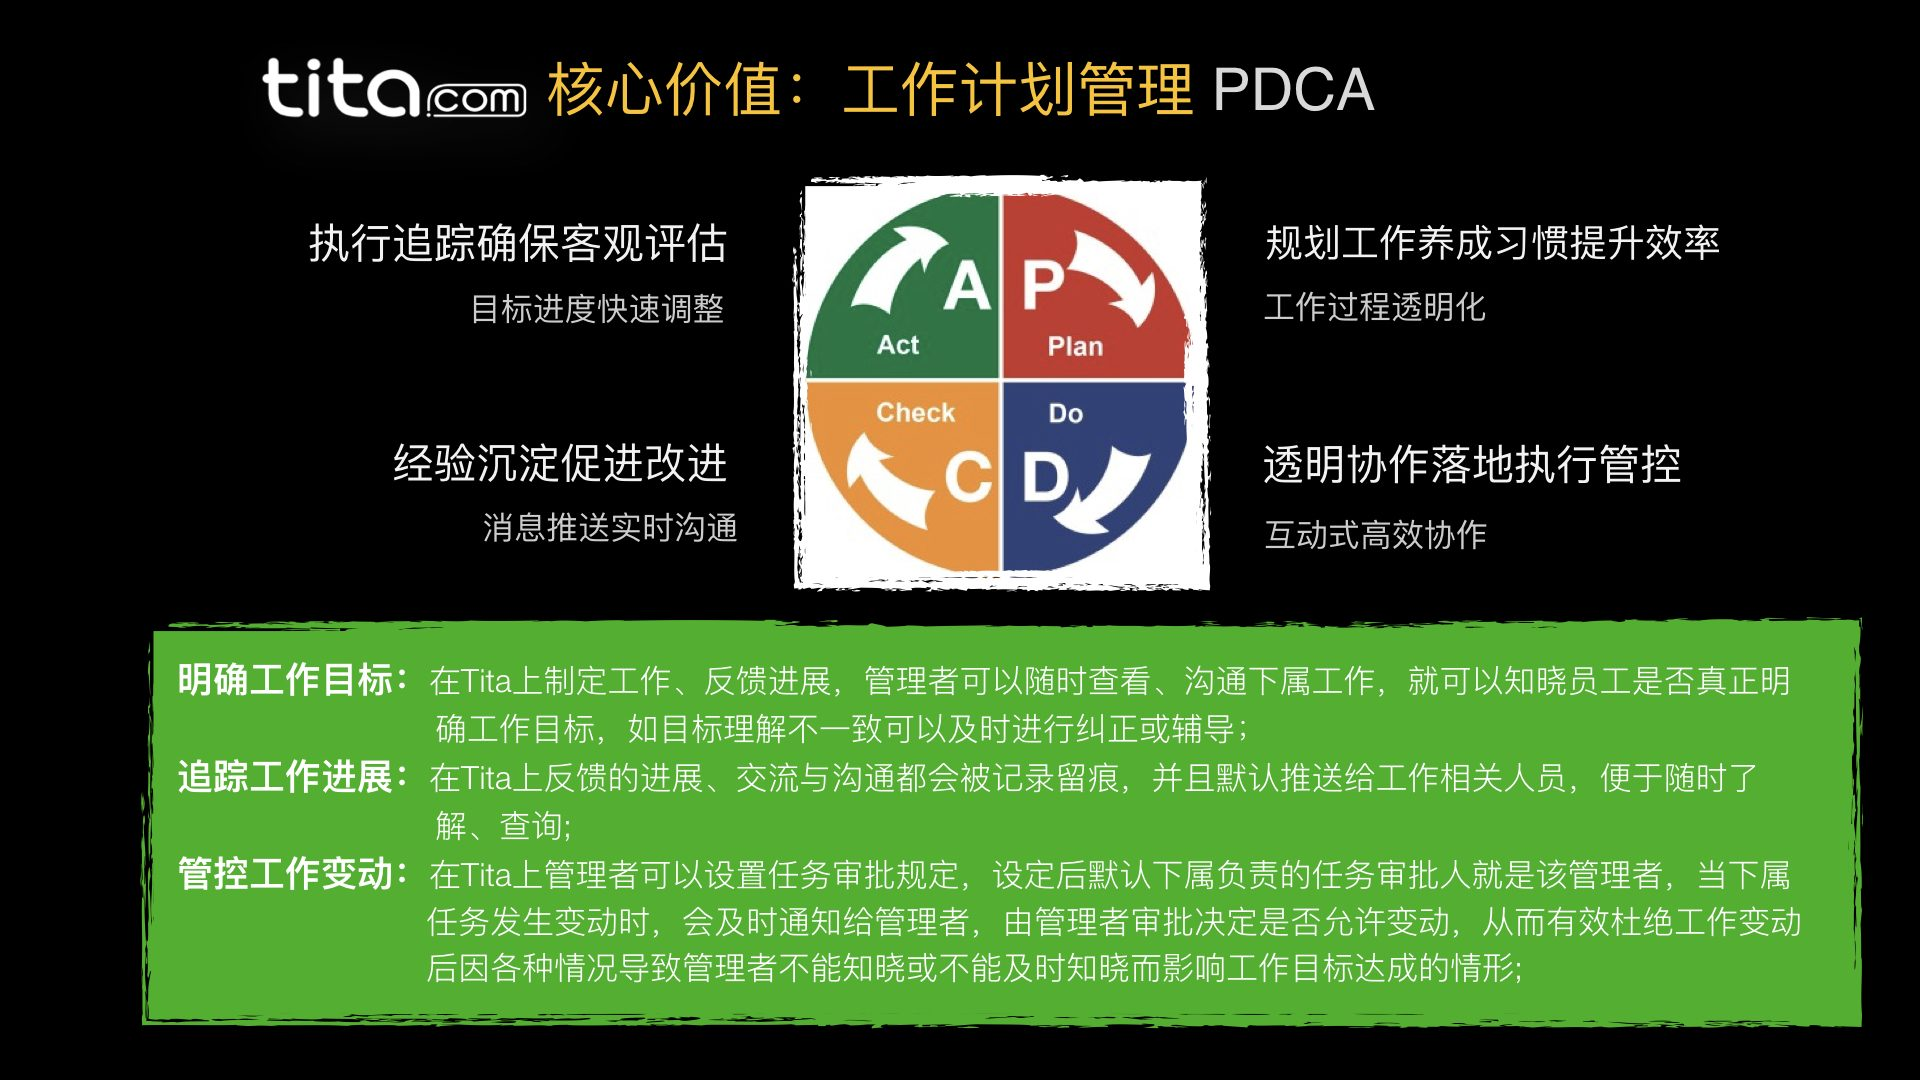 Tita《企业工作计划管理》产品介绍 @2020